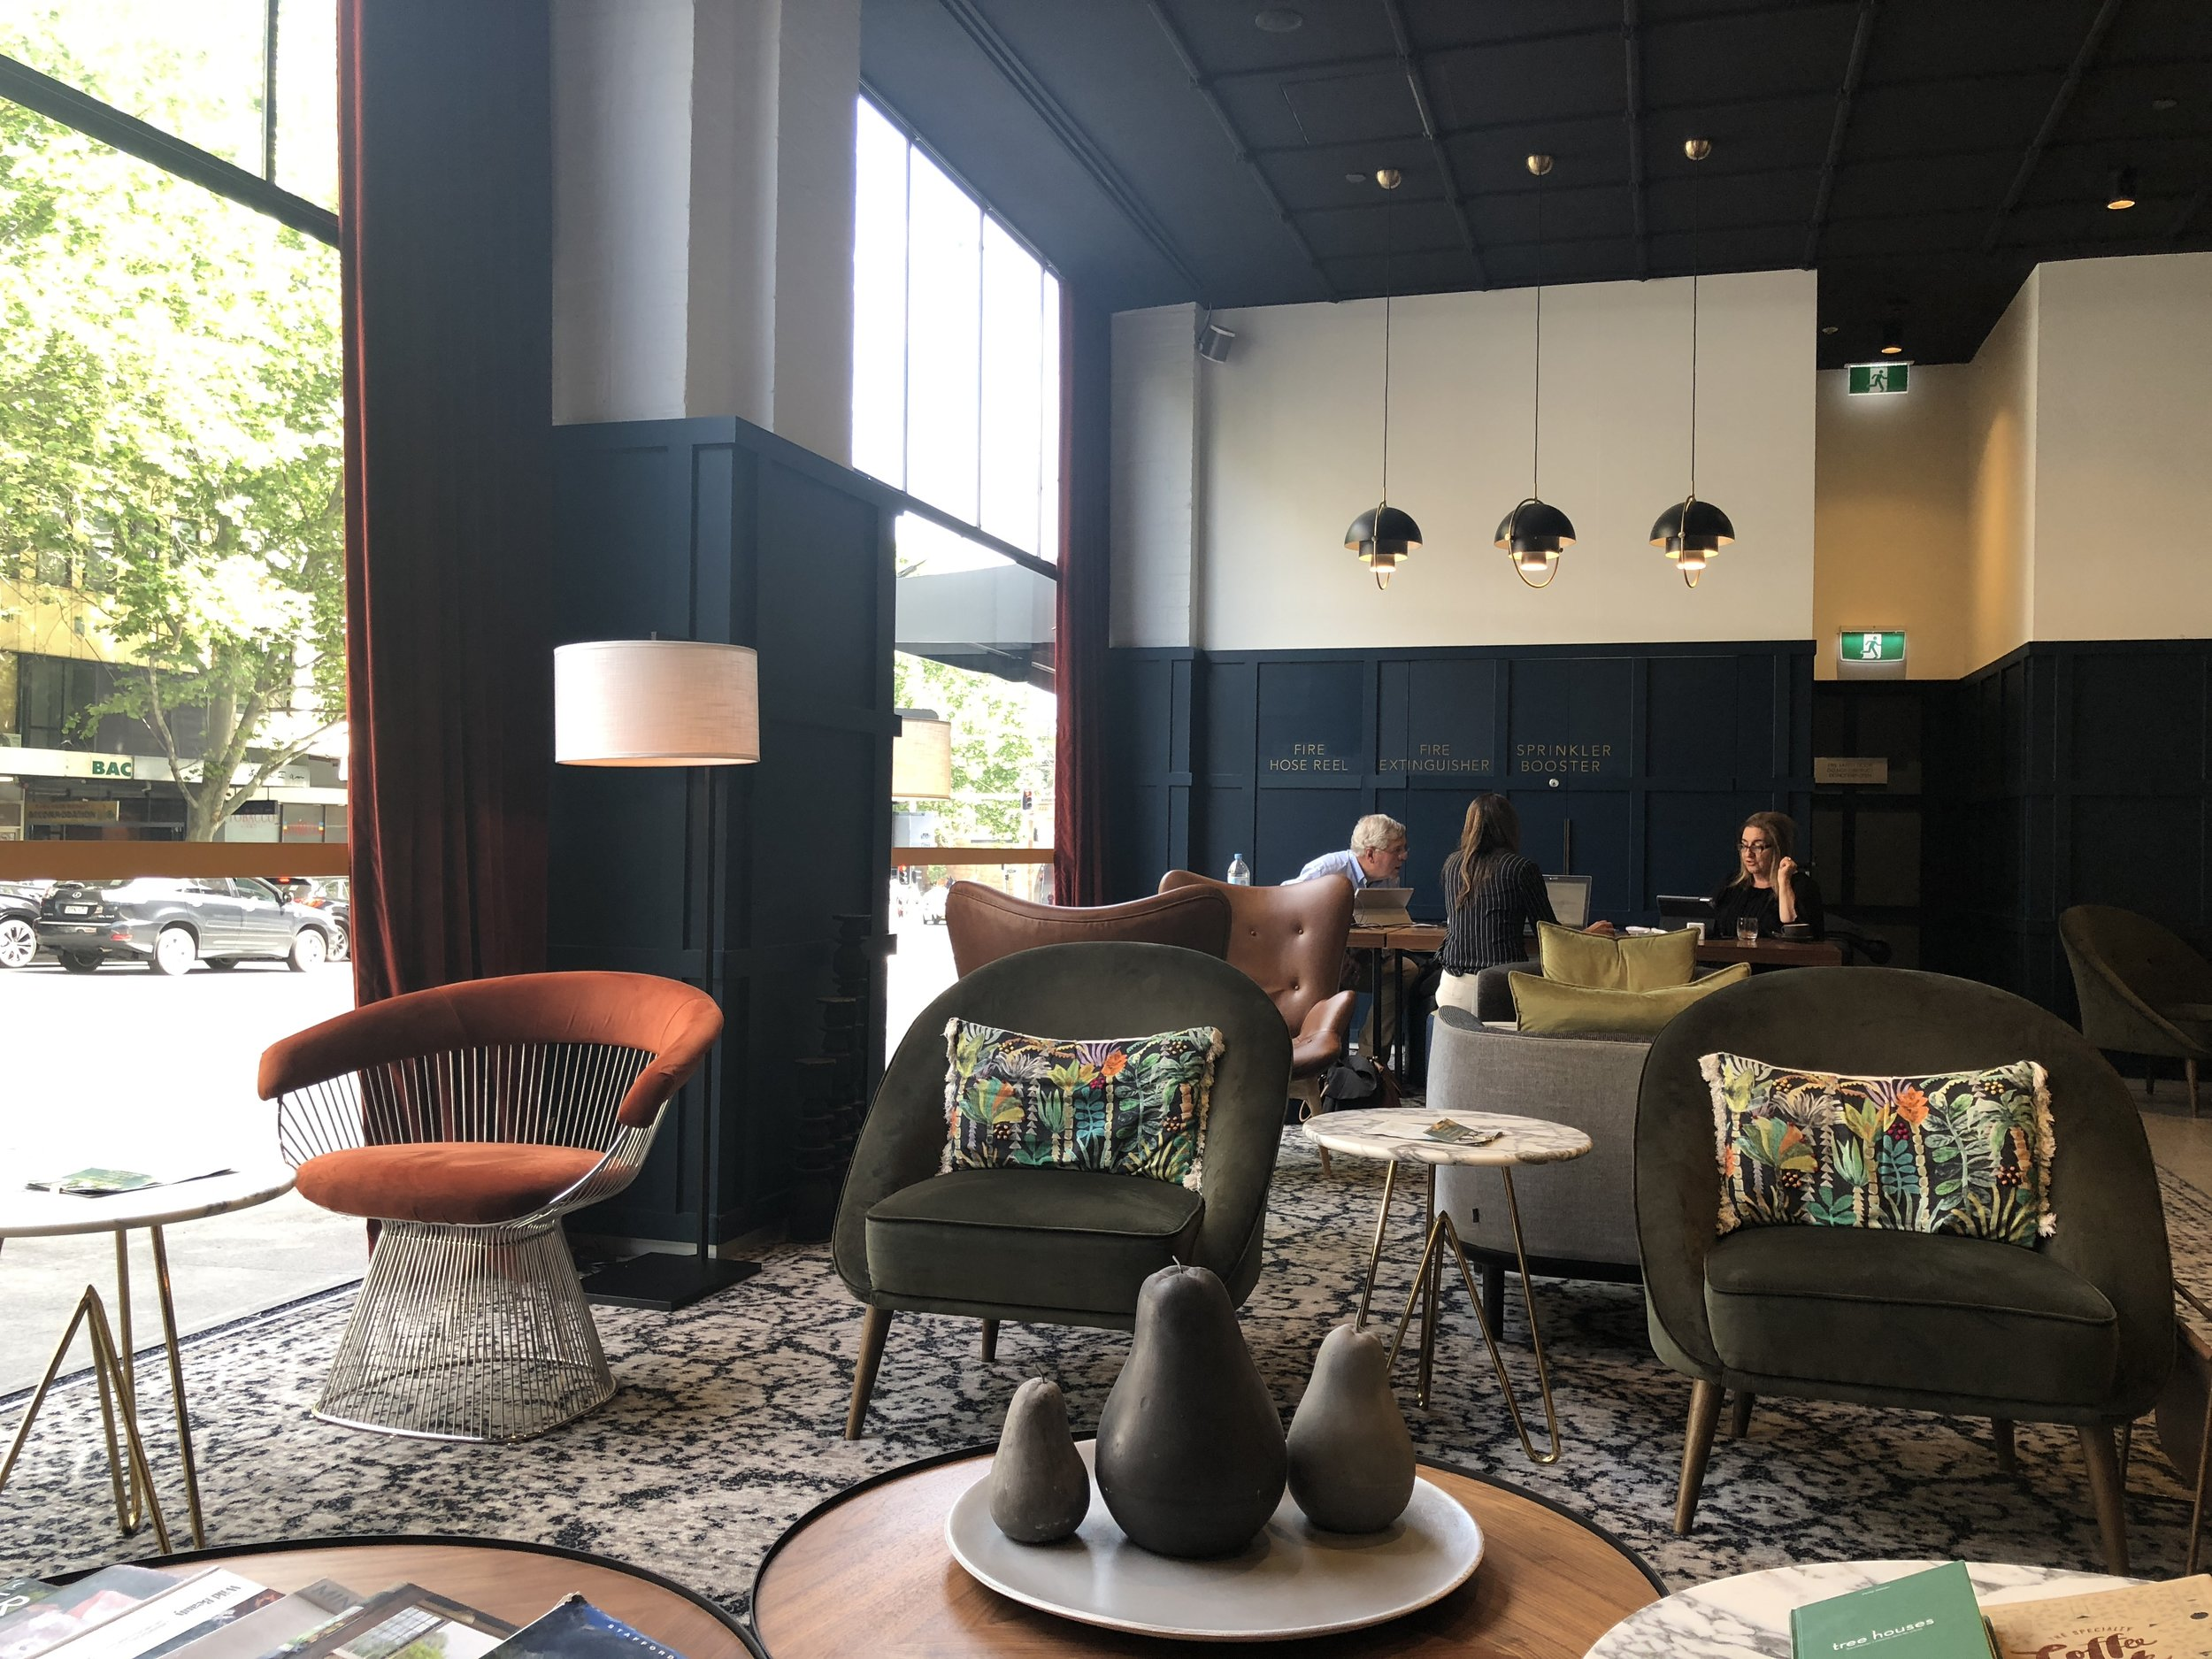 The lounge at Veriu Hotel, Sydney (photo by Slobodanka Graham)